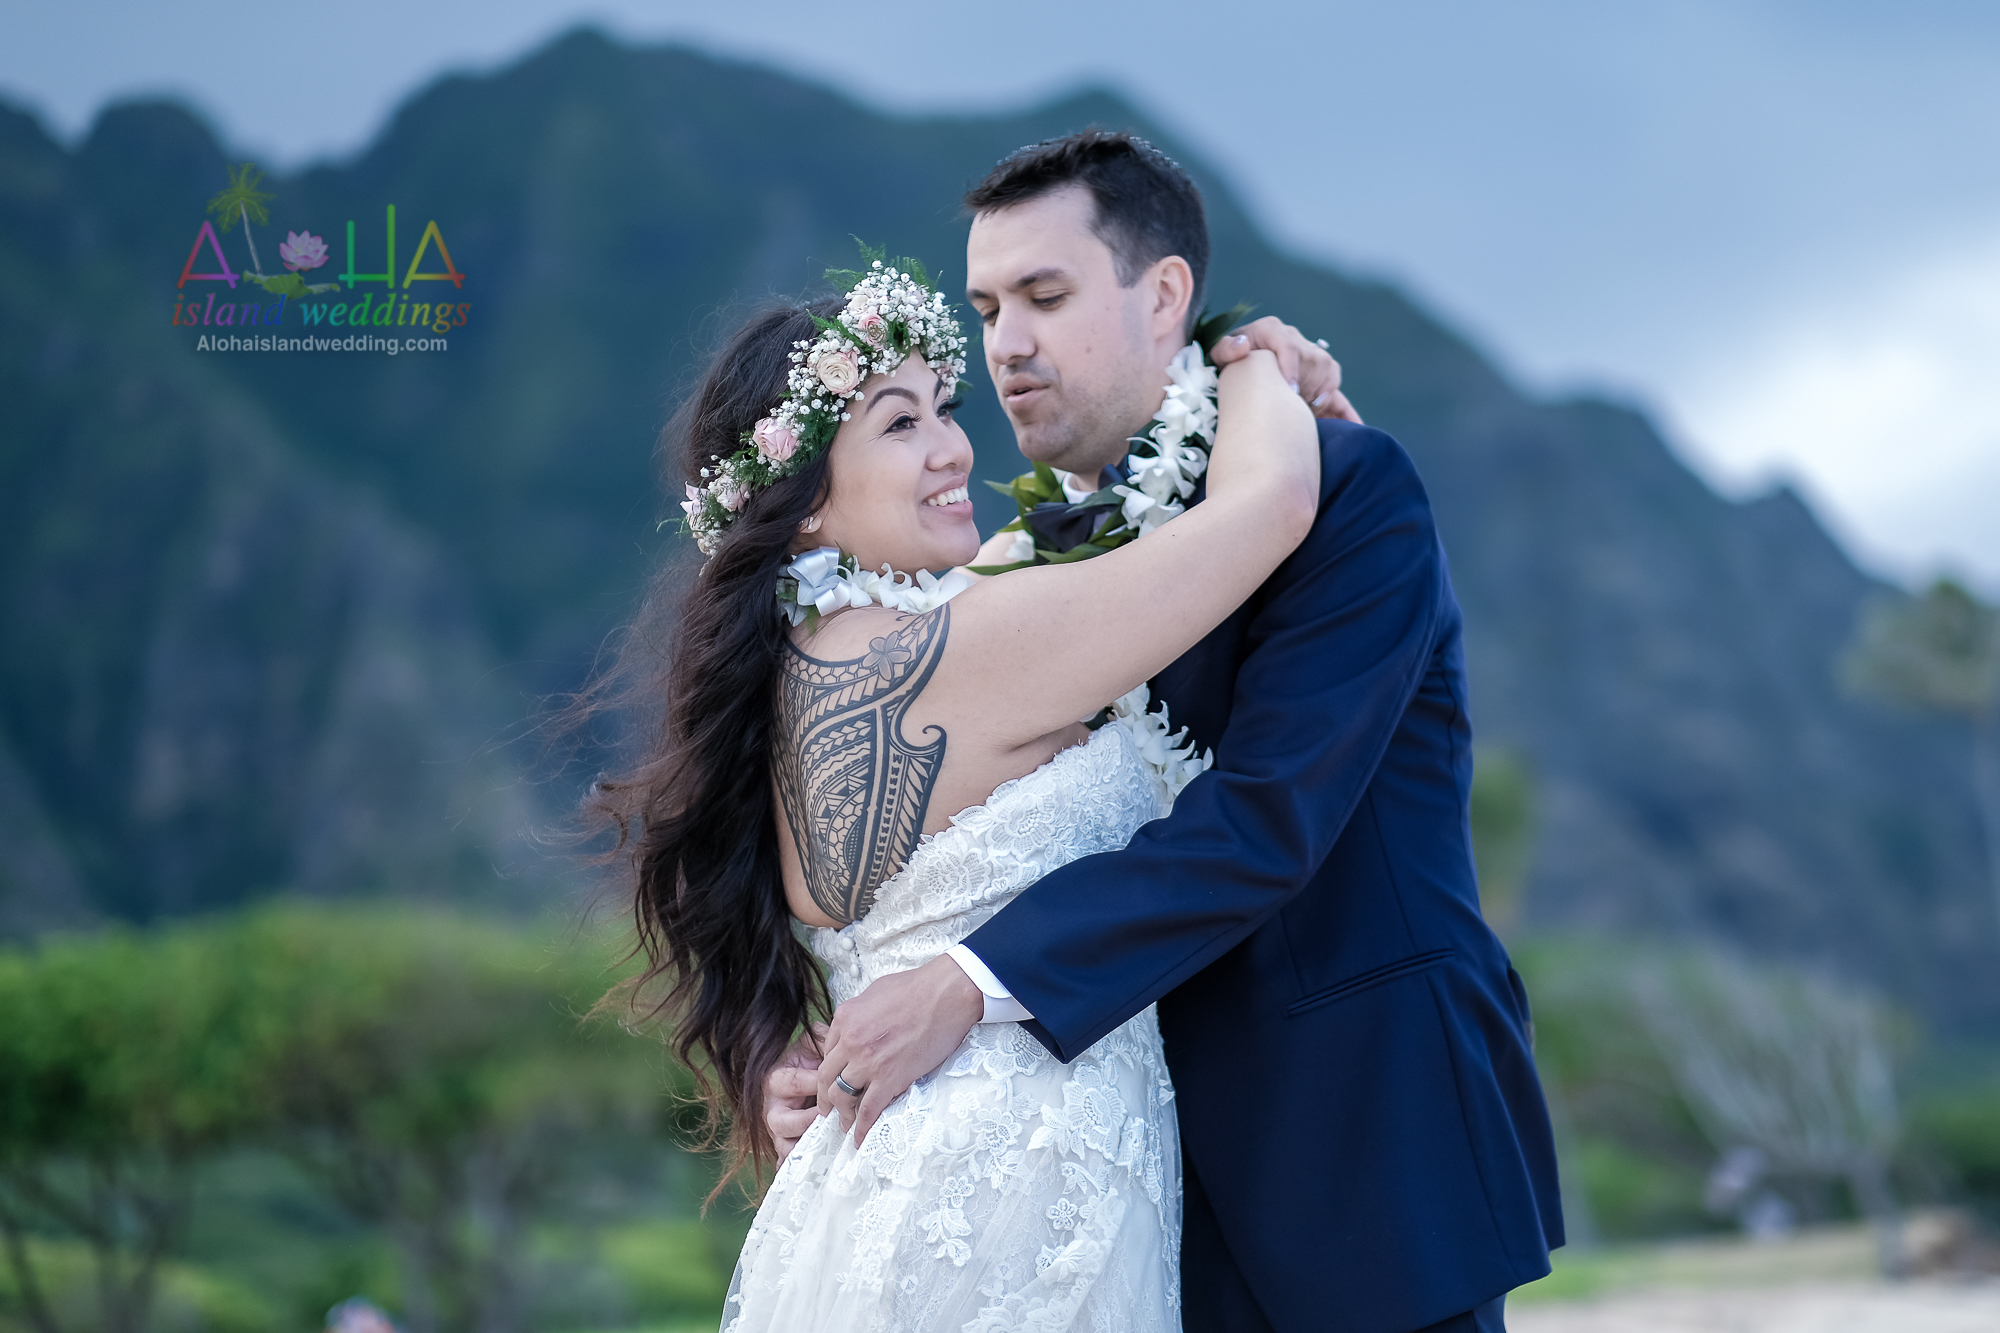 Hawaii weddings and events, Kualoa-19